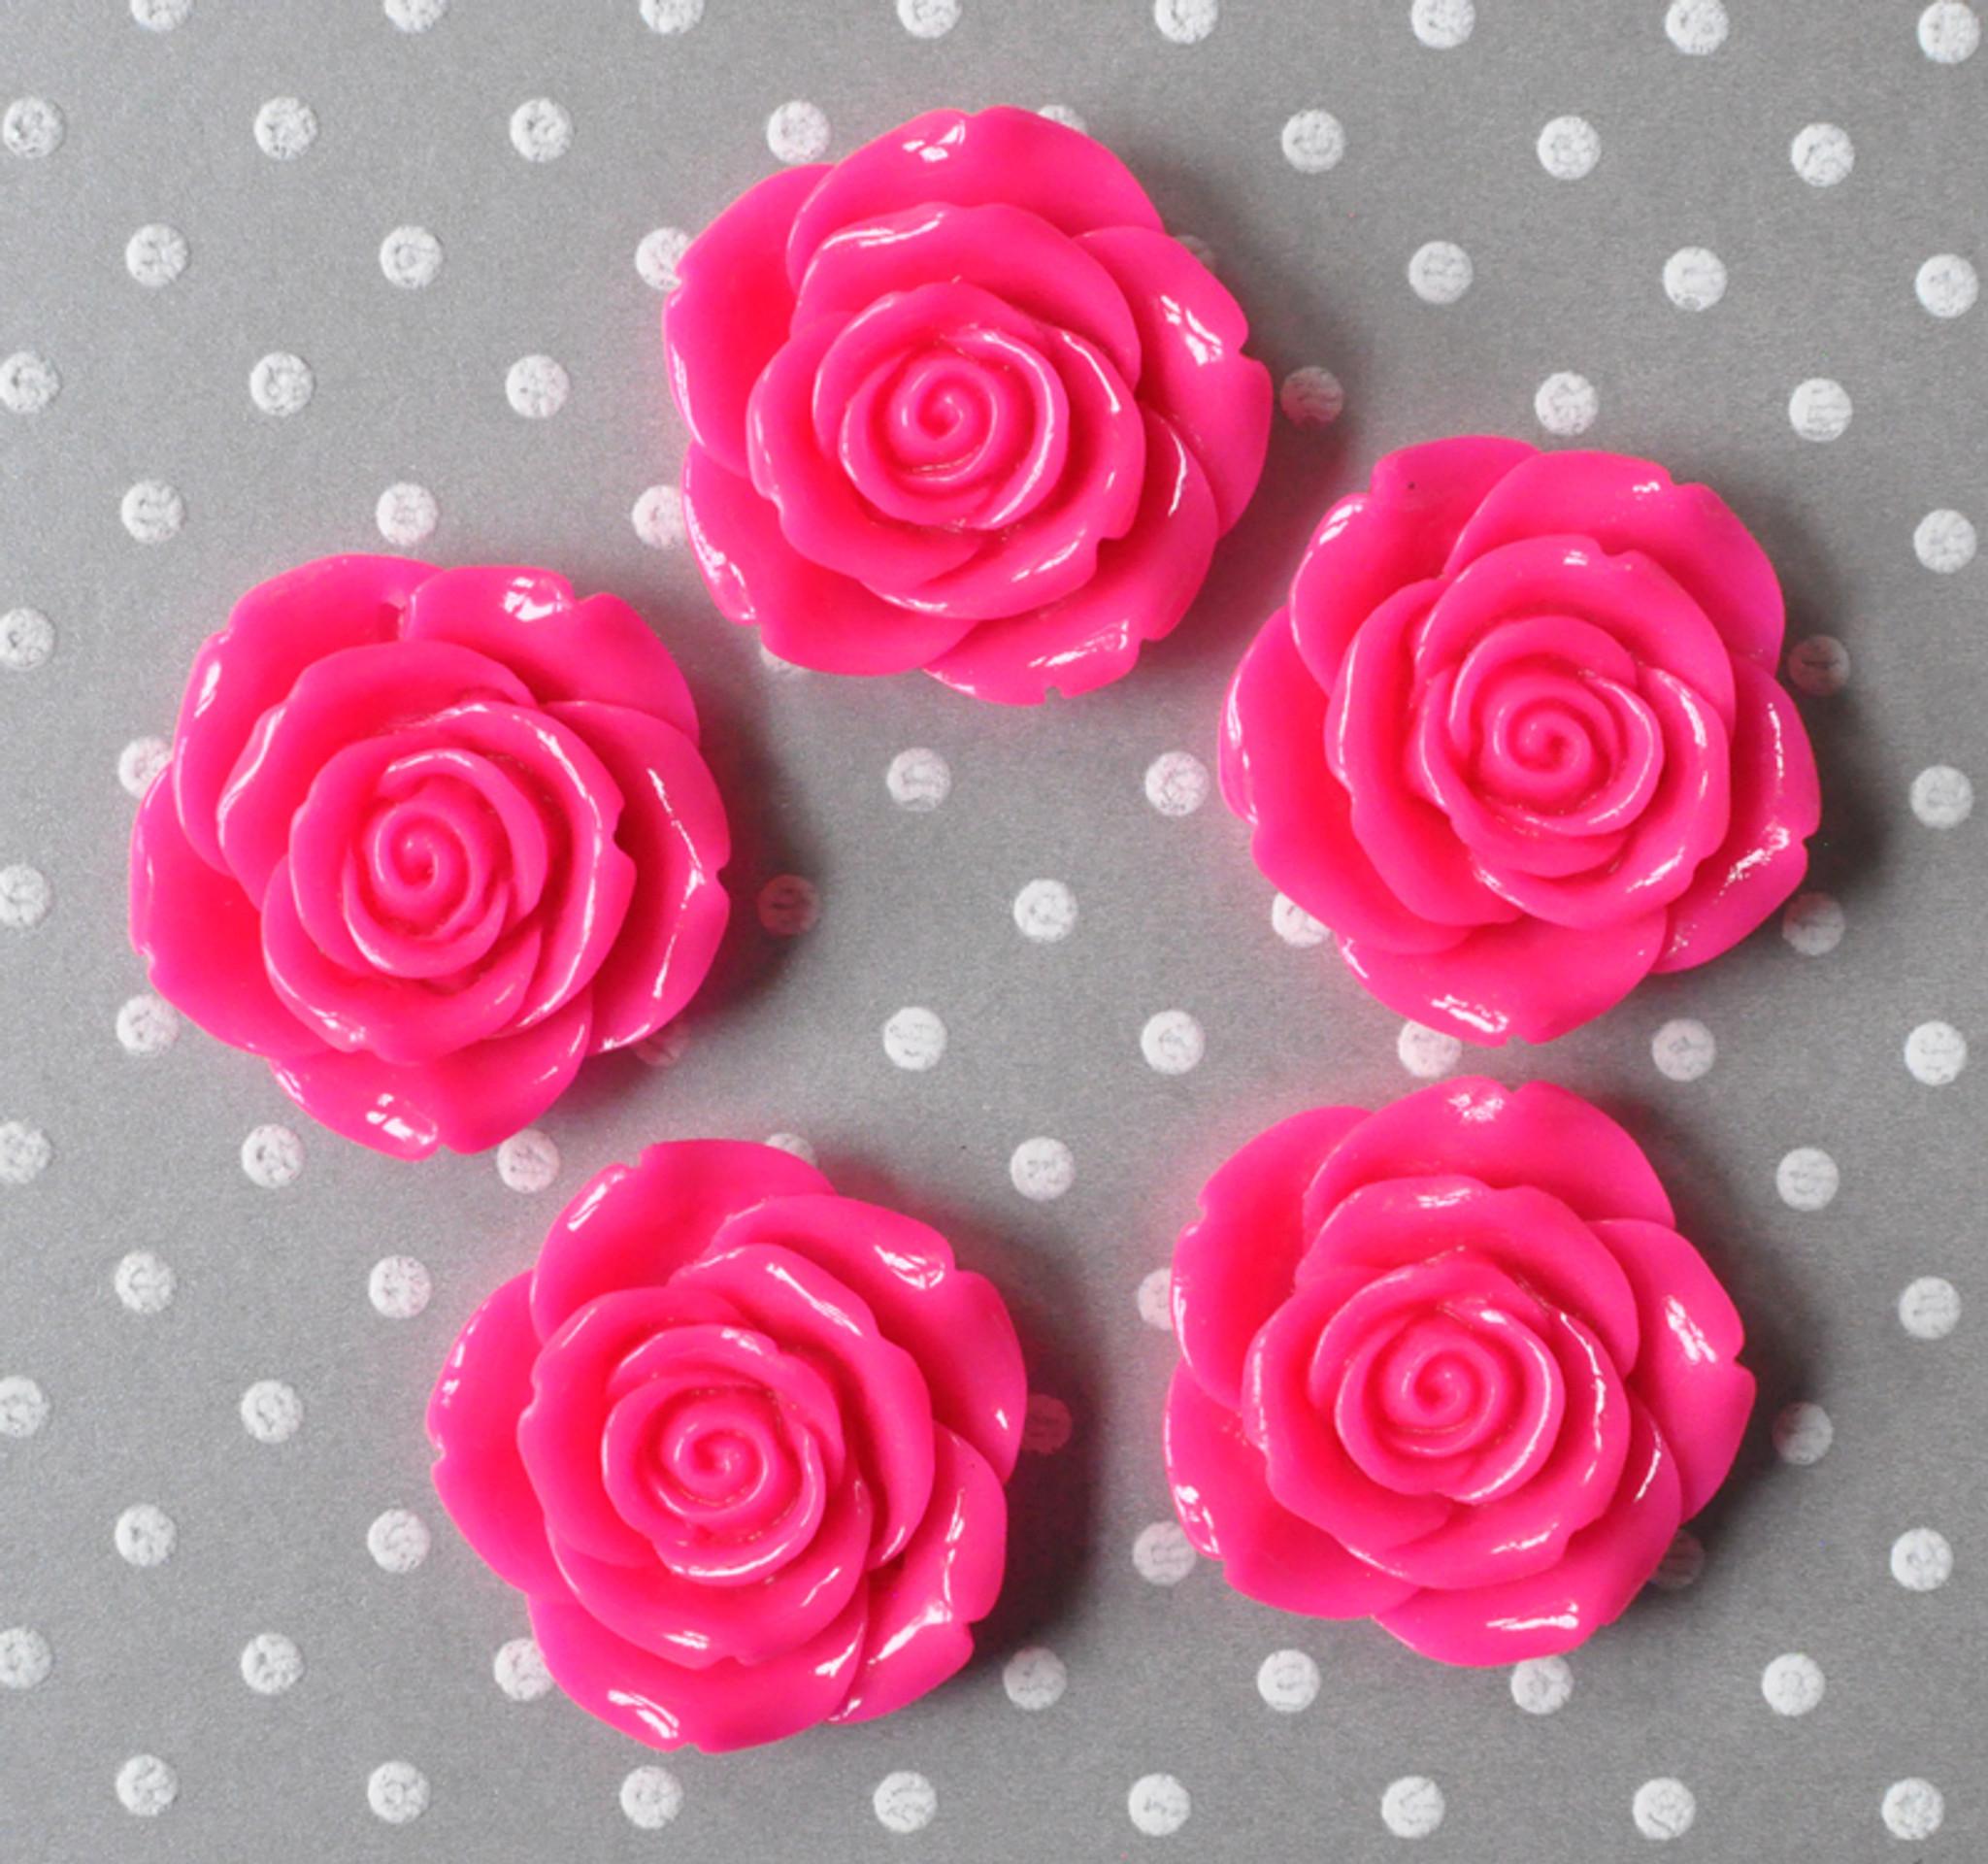 42mm Shocking pink resin flower beads wholesale